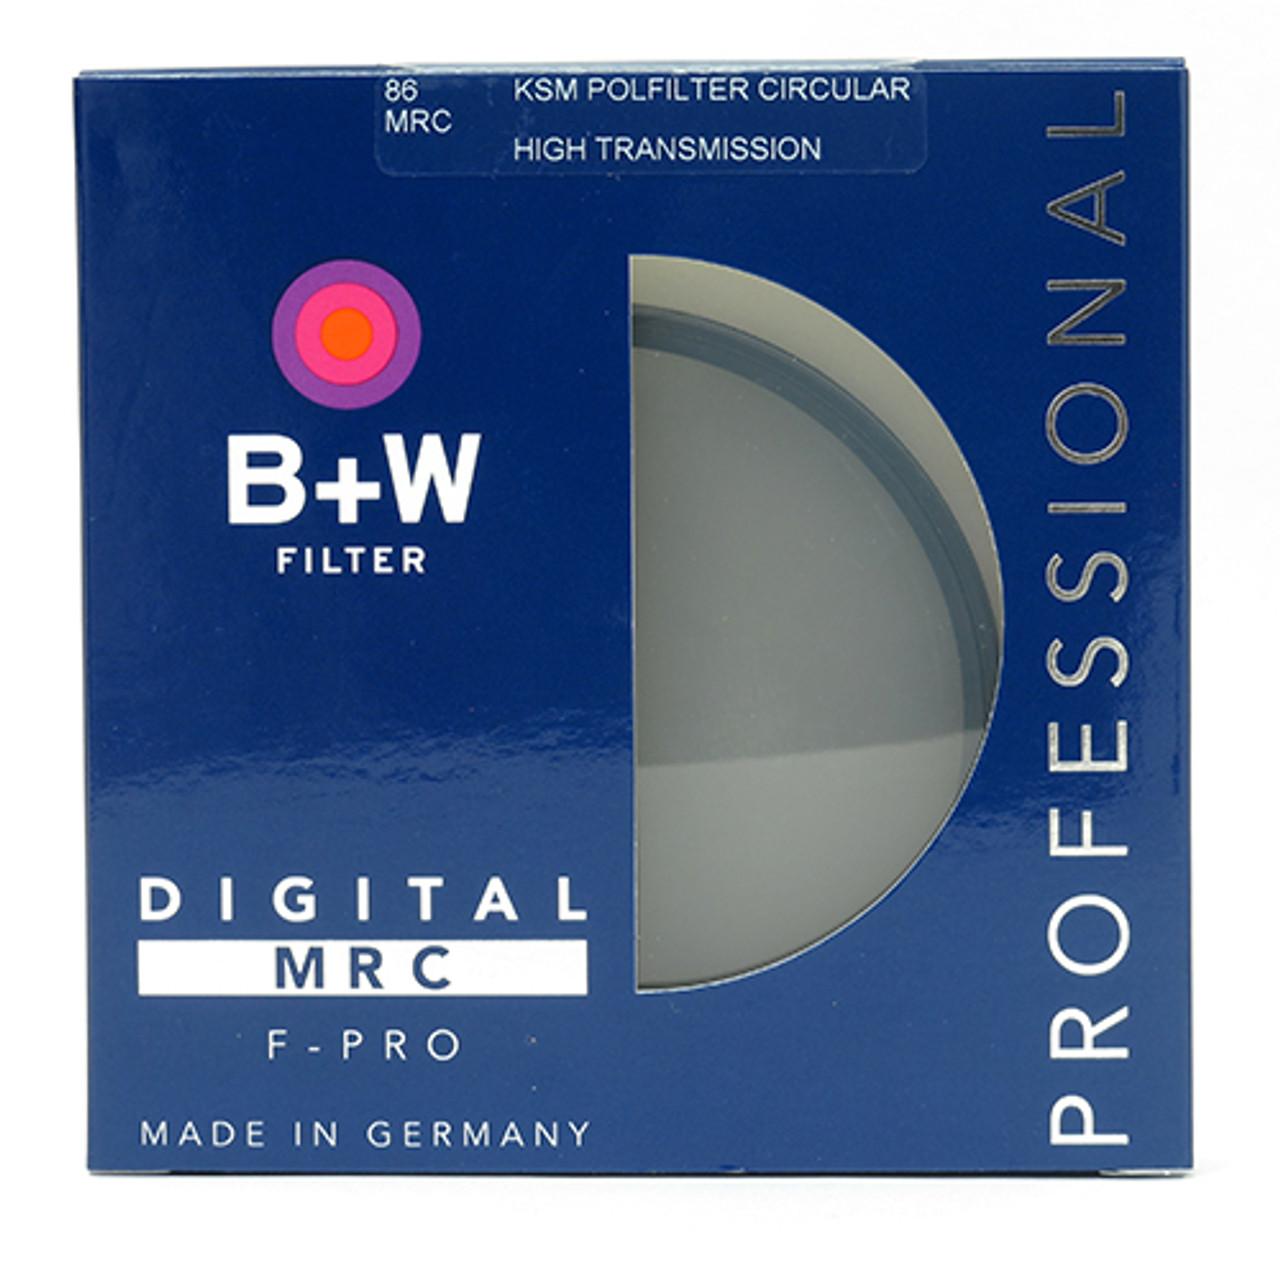 B+W KAESEMANN CIRCULAR POLARIZER HTC (86MM)